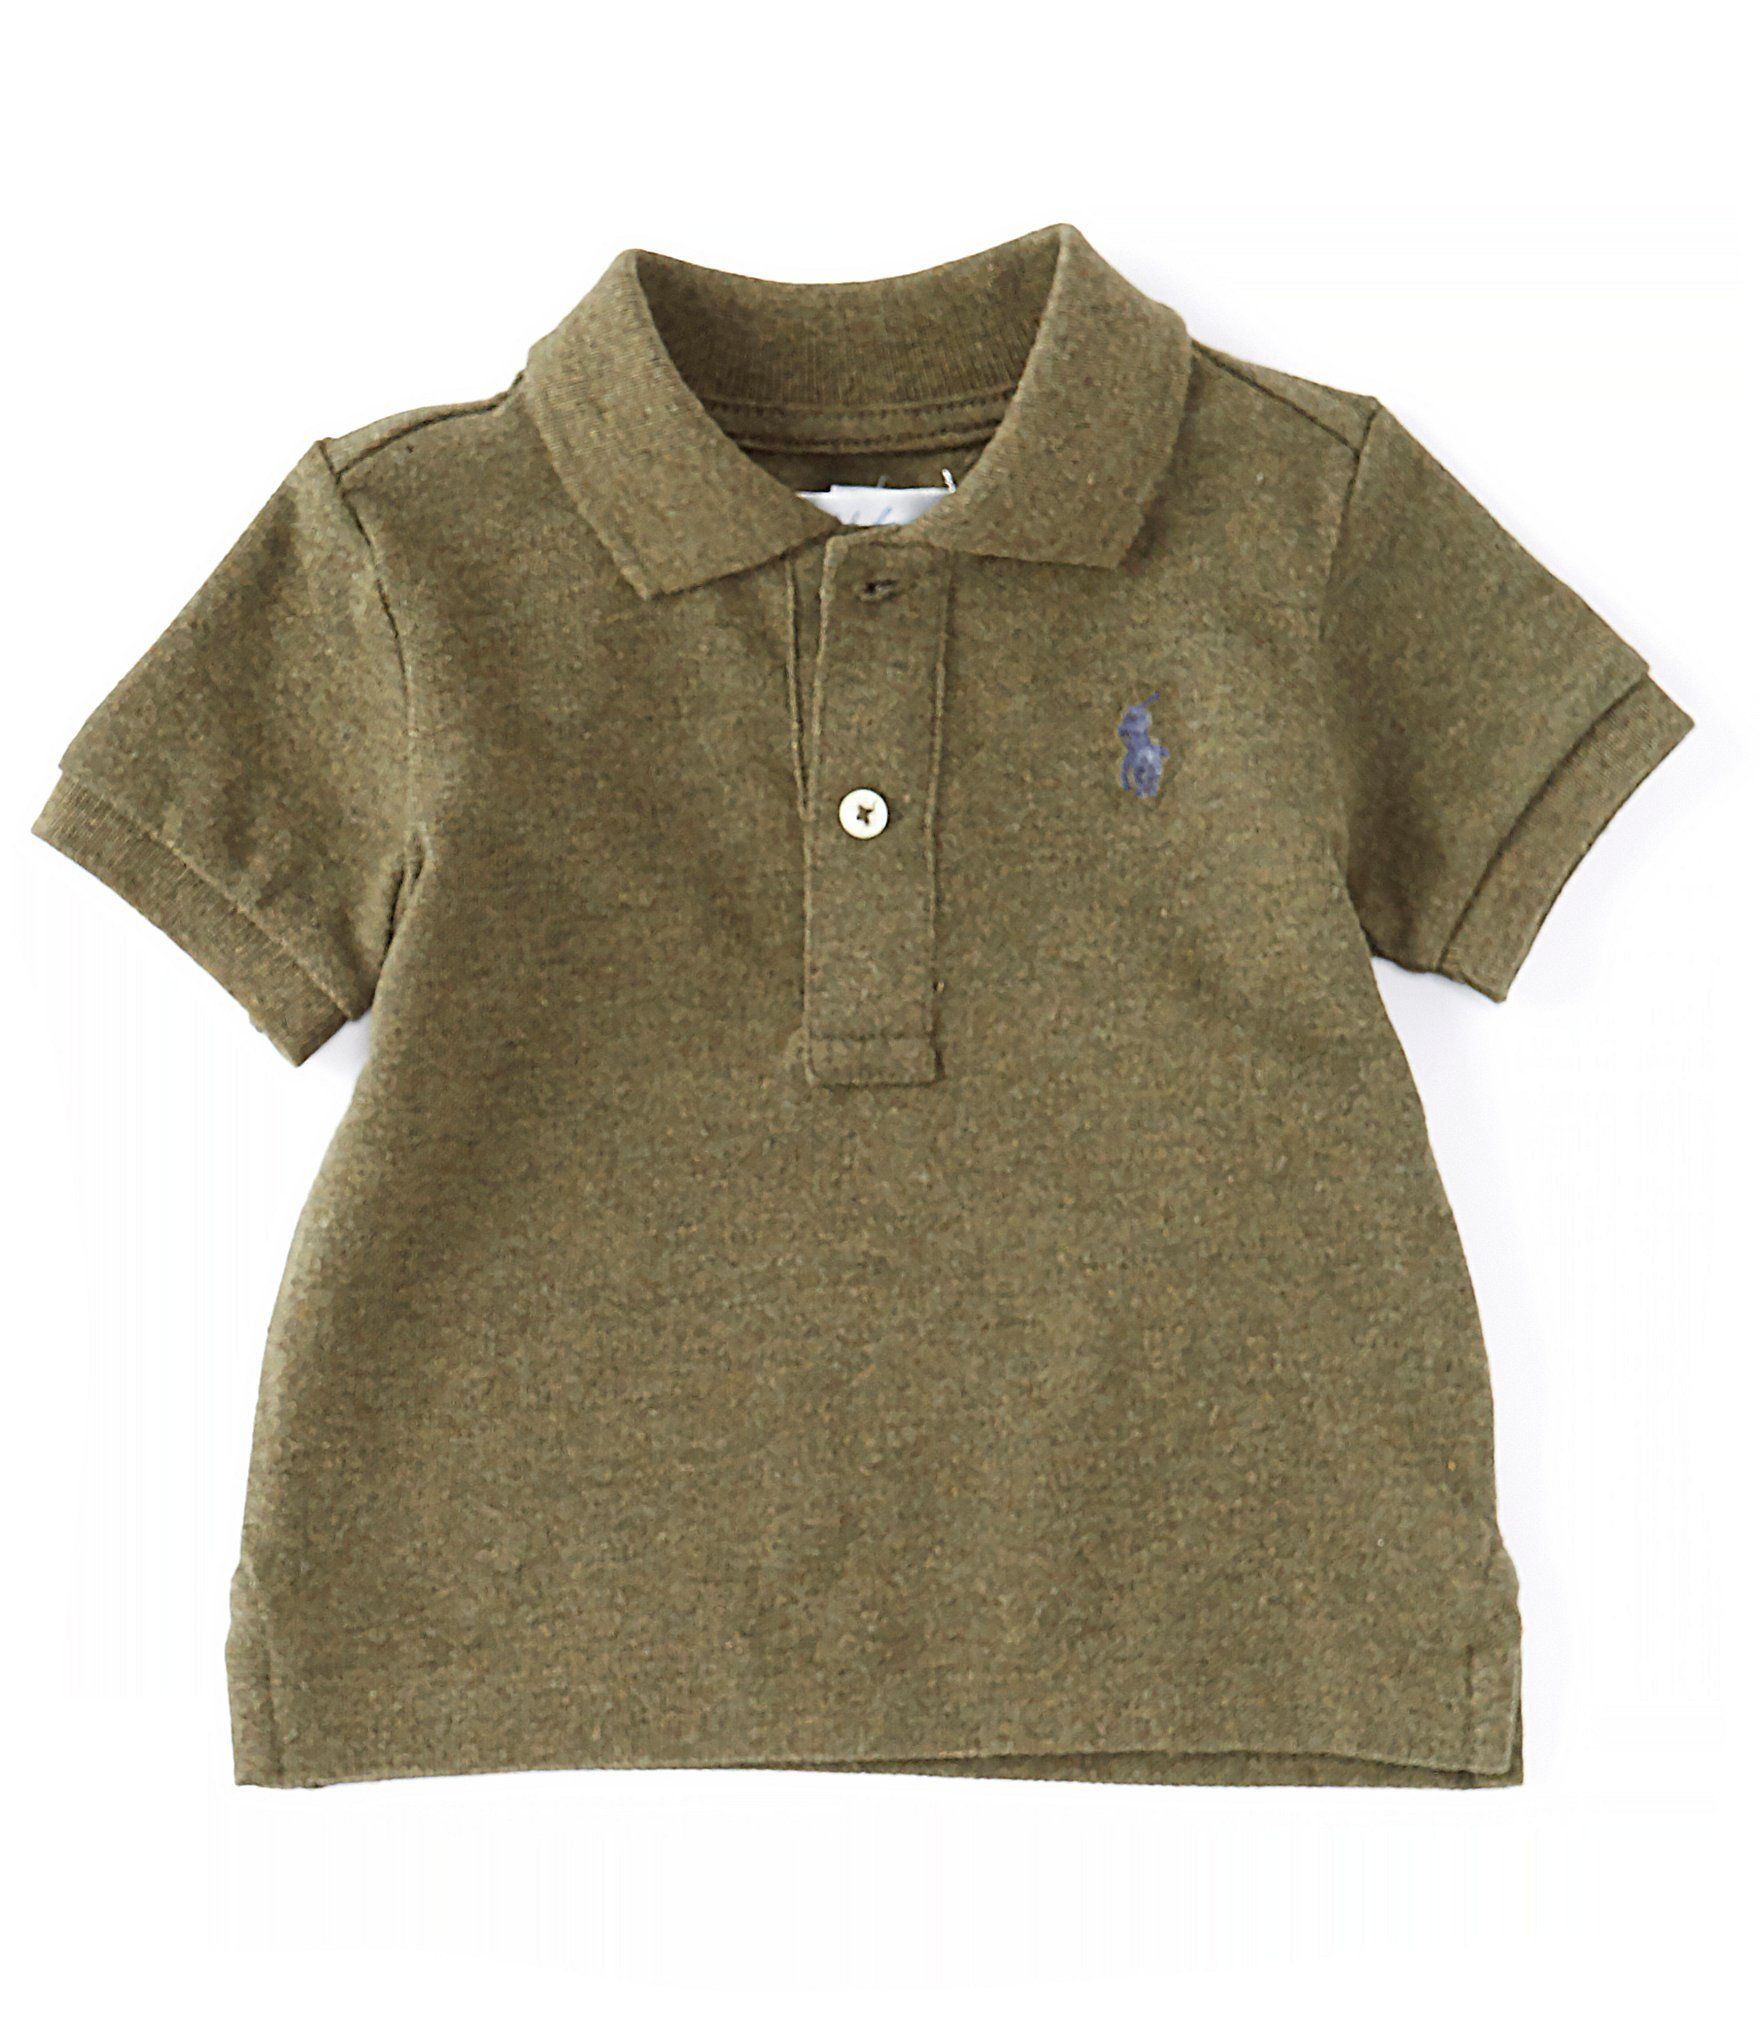 POLO RALPH LAUREN Baby Boys/' Short Sleeve T-shirt Grey Heather 18 or 24 months